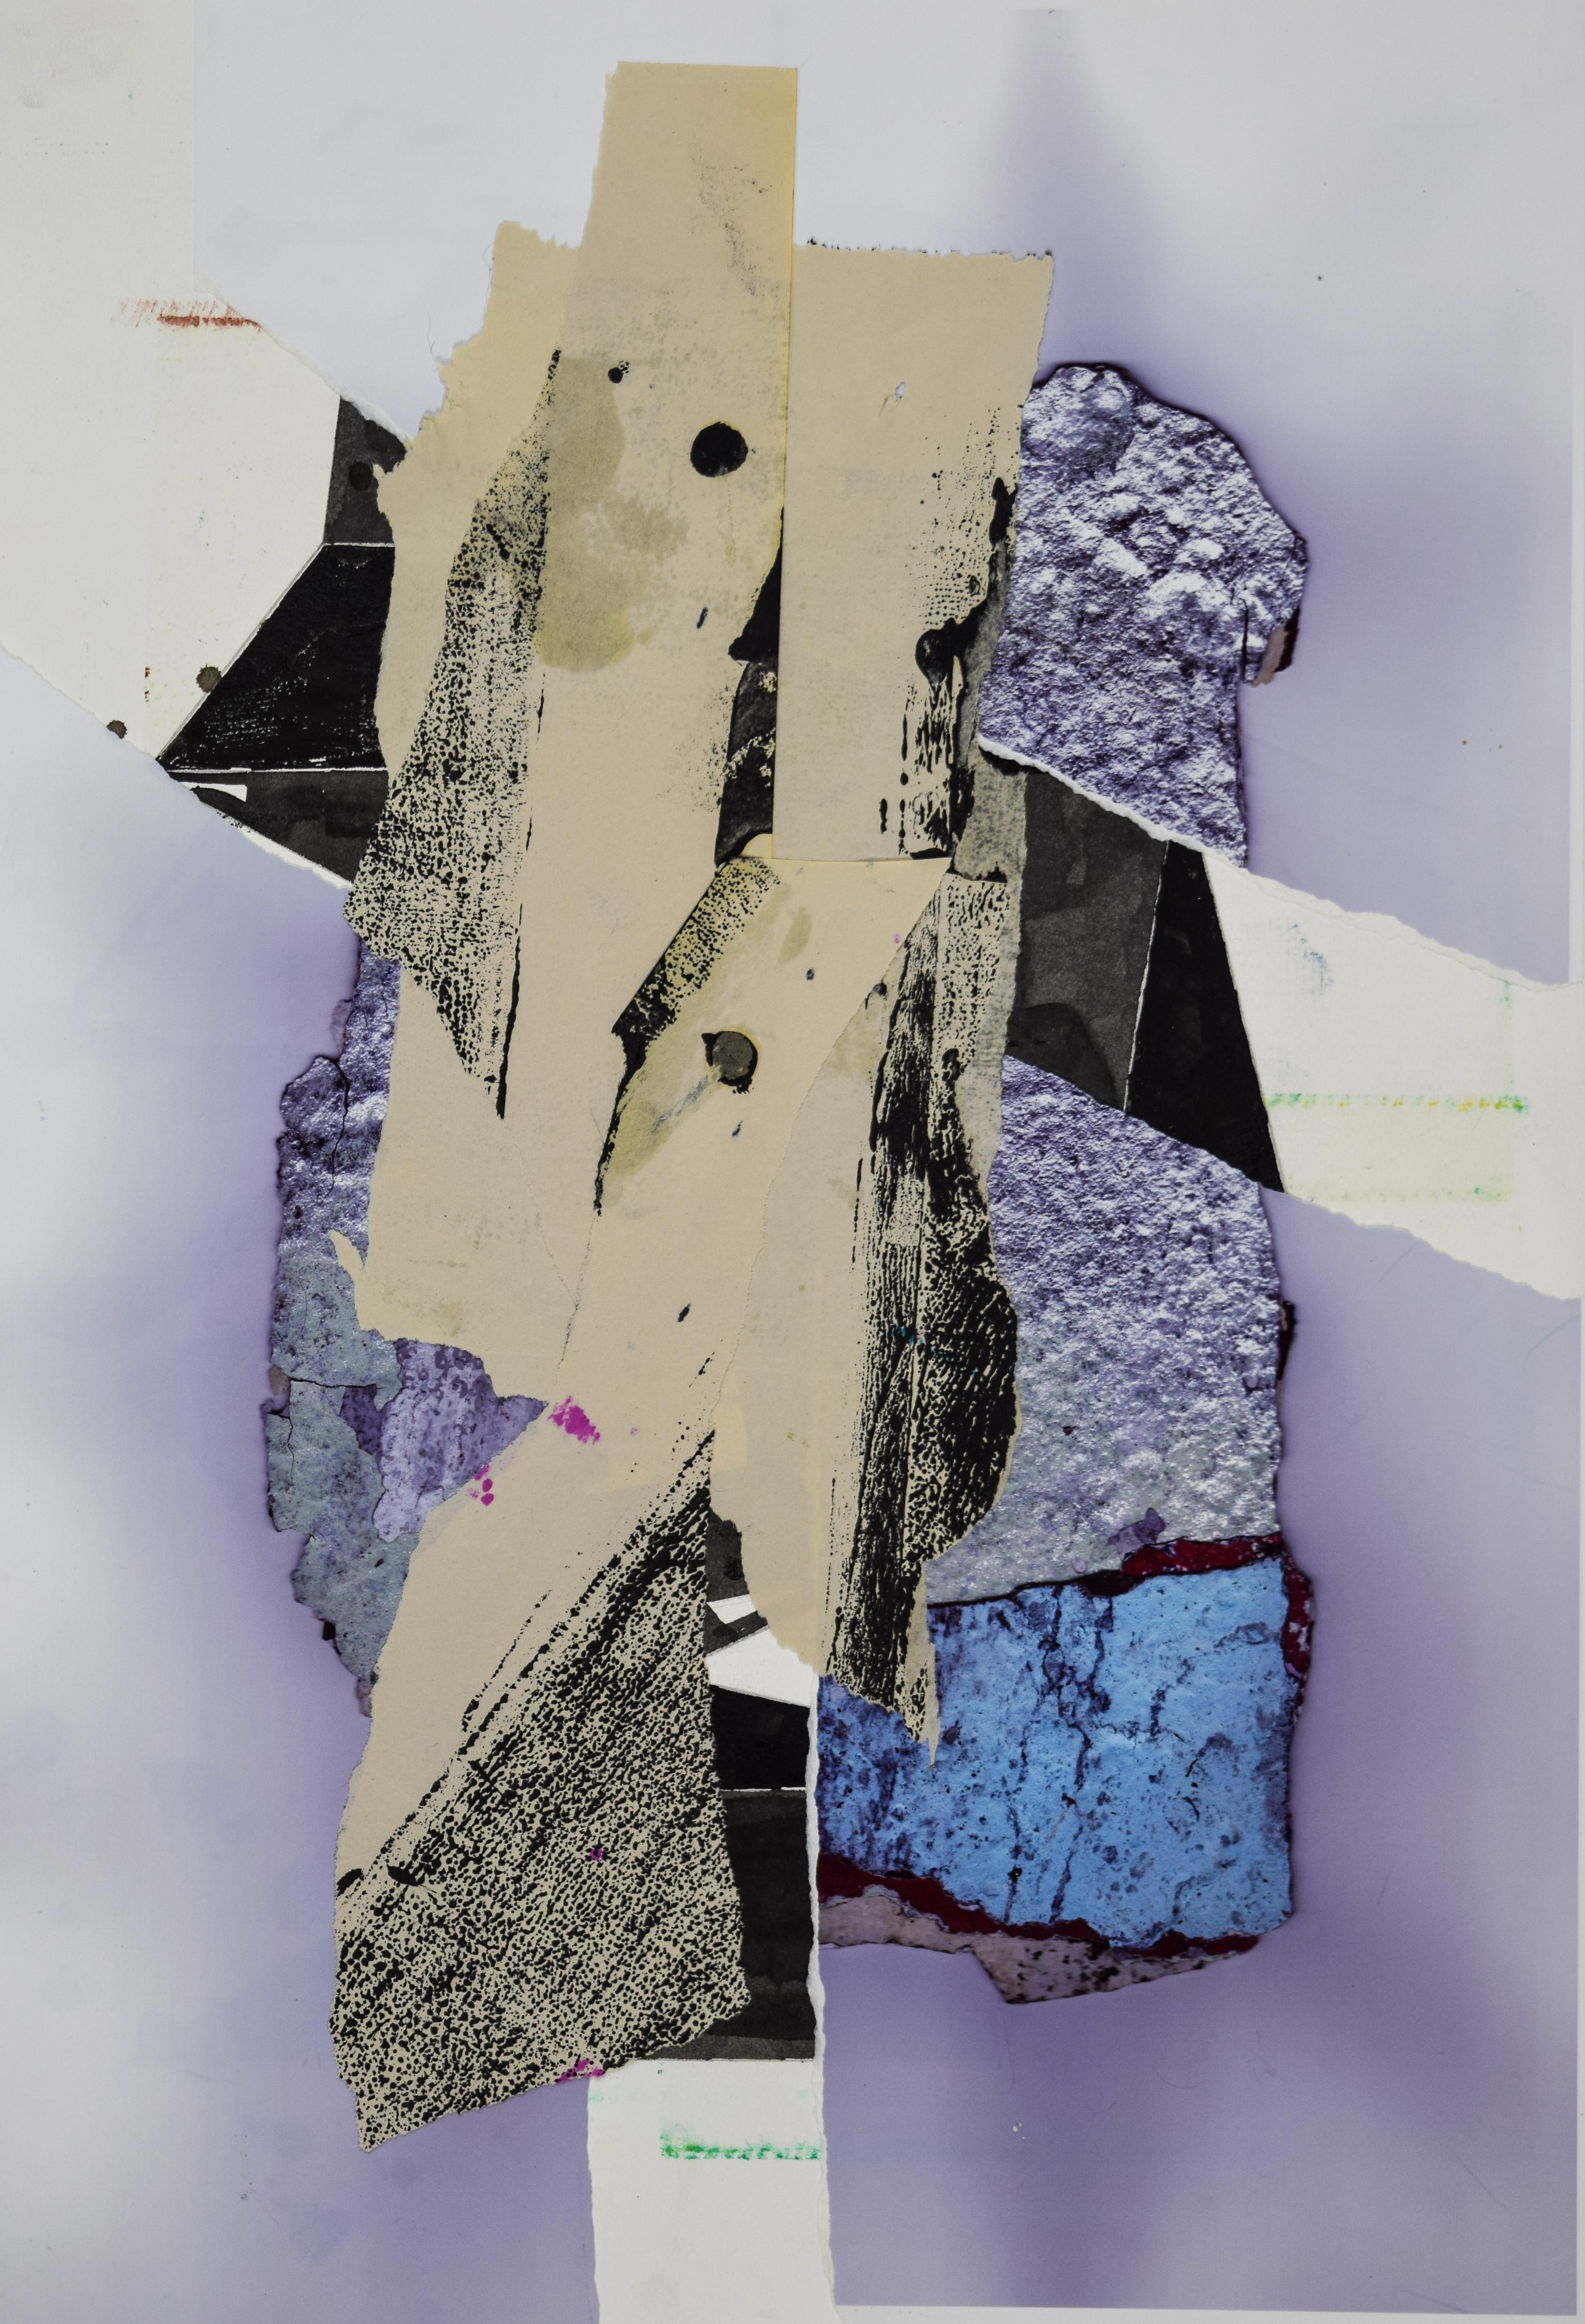 KJ Schumacher, Untitled (c014), mixed media collage, 22 x 15 in, 2020